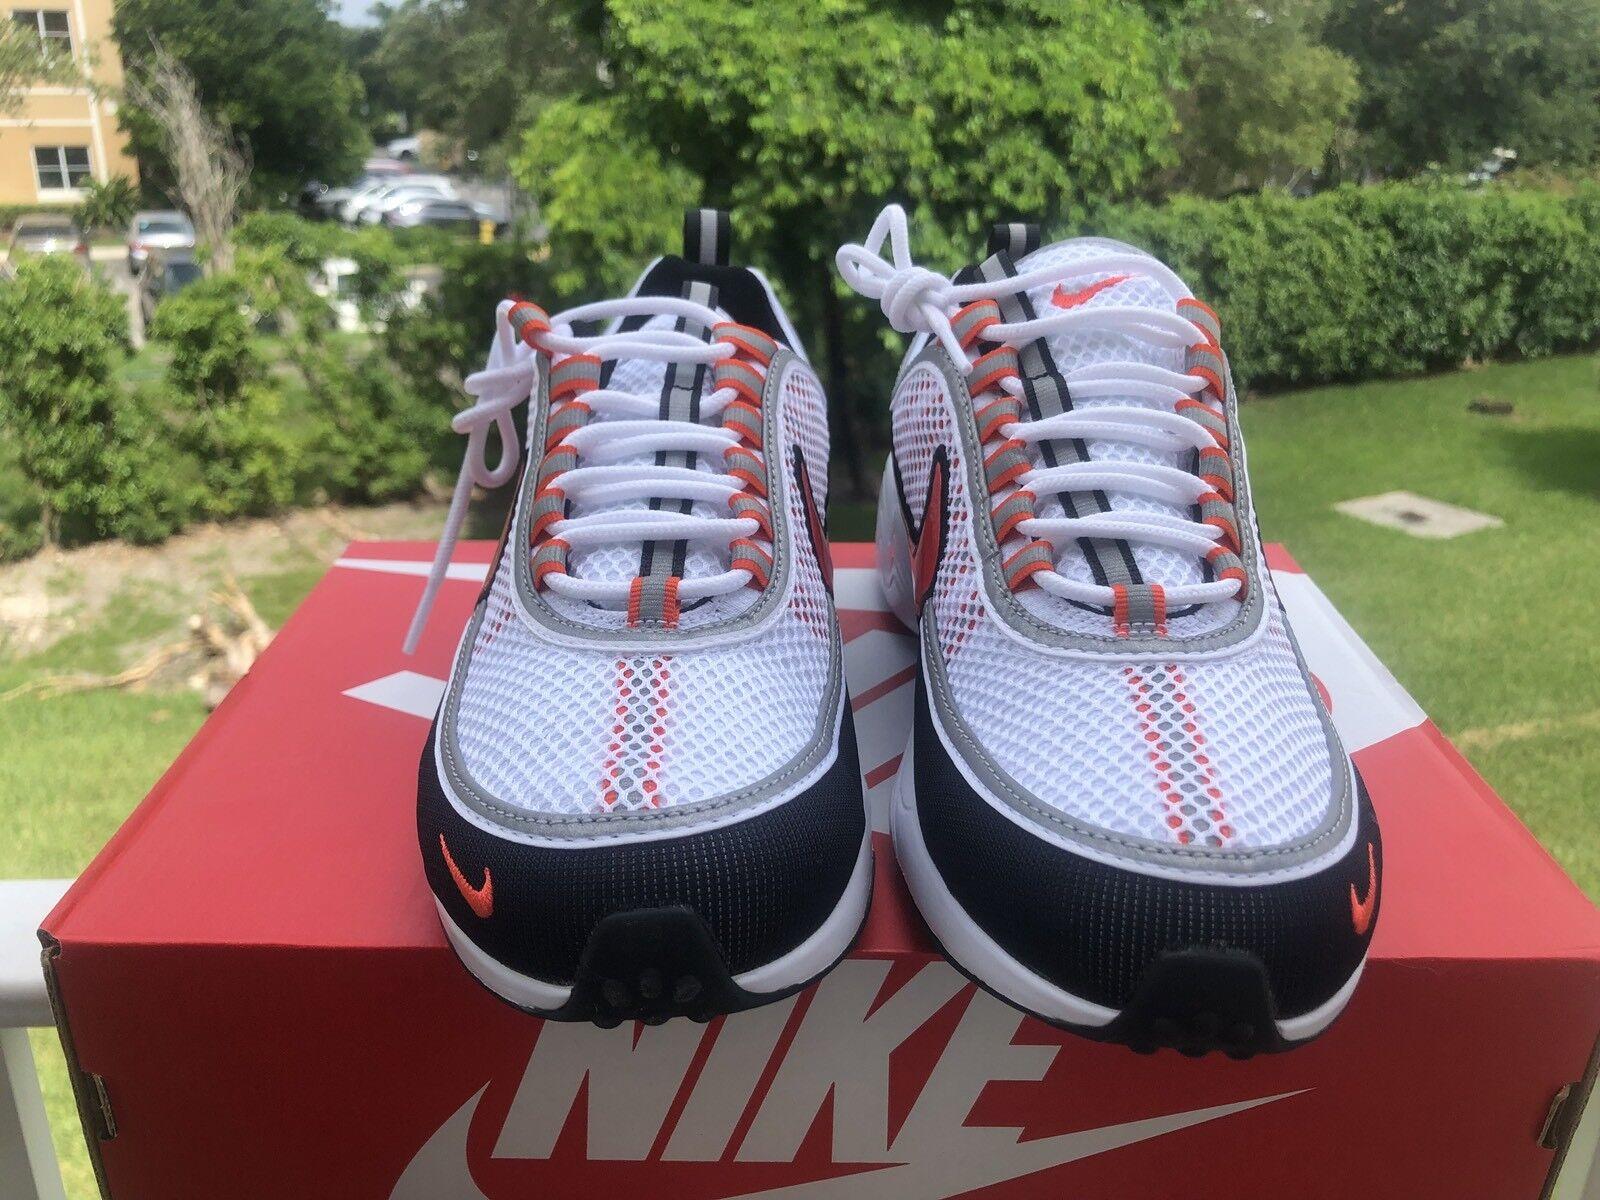 Nike Air Zoom Spiridon '16 White Team orange Black Size 11.5 Running Casual